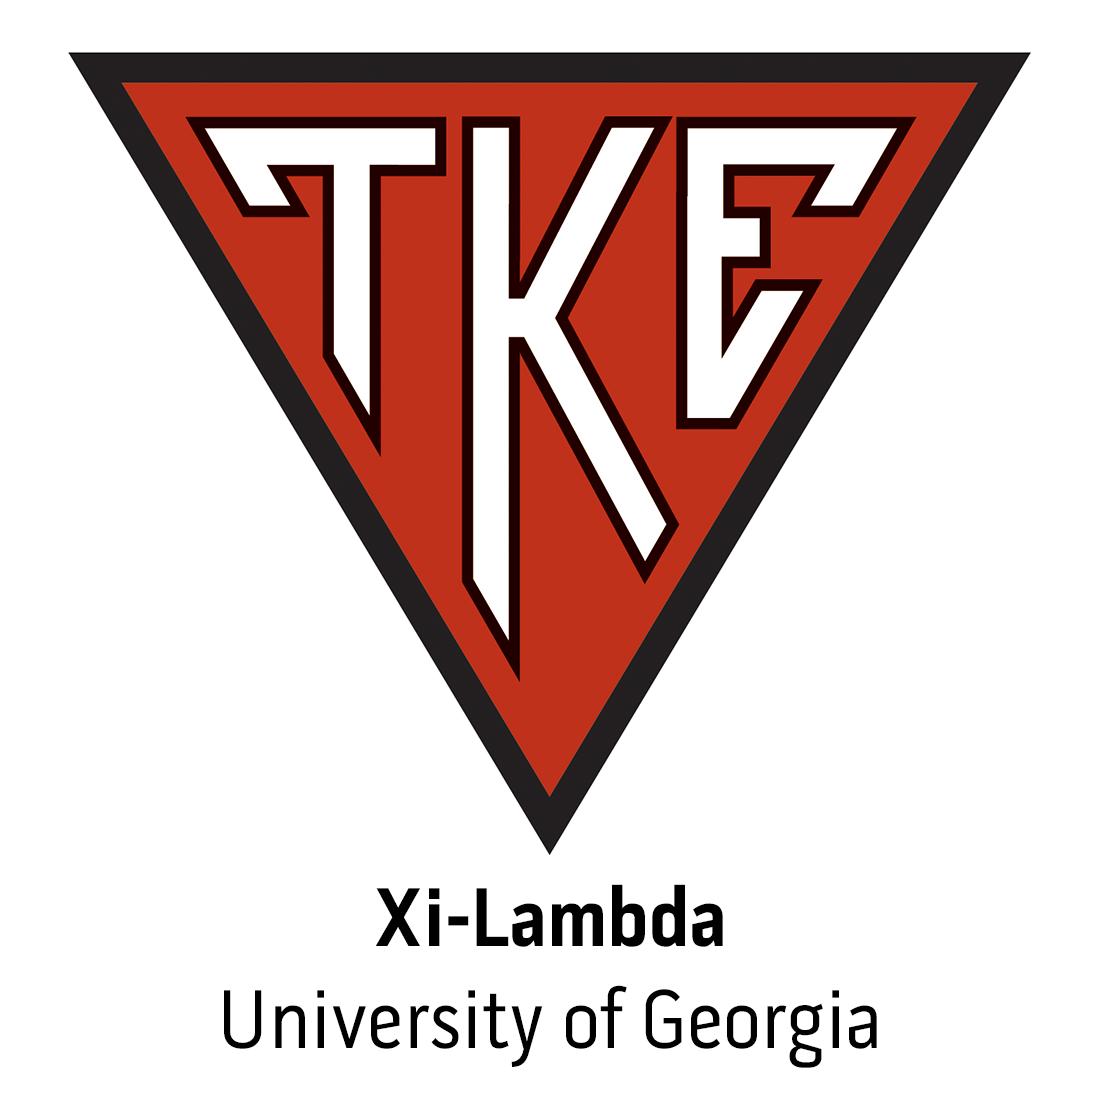 Xi-Lambda Chapter at University of Georgia